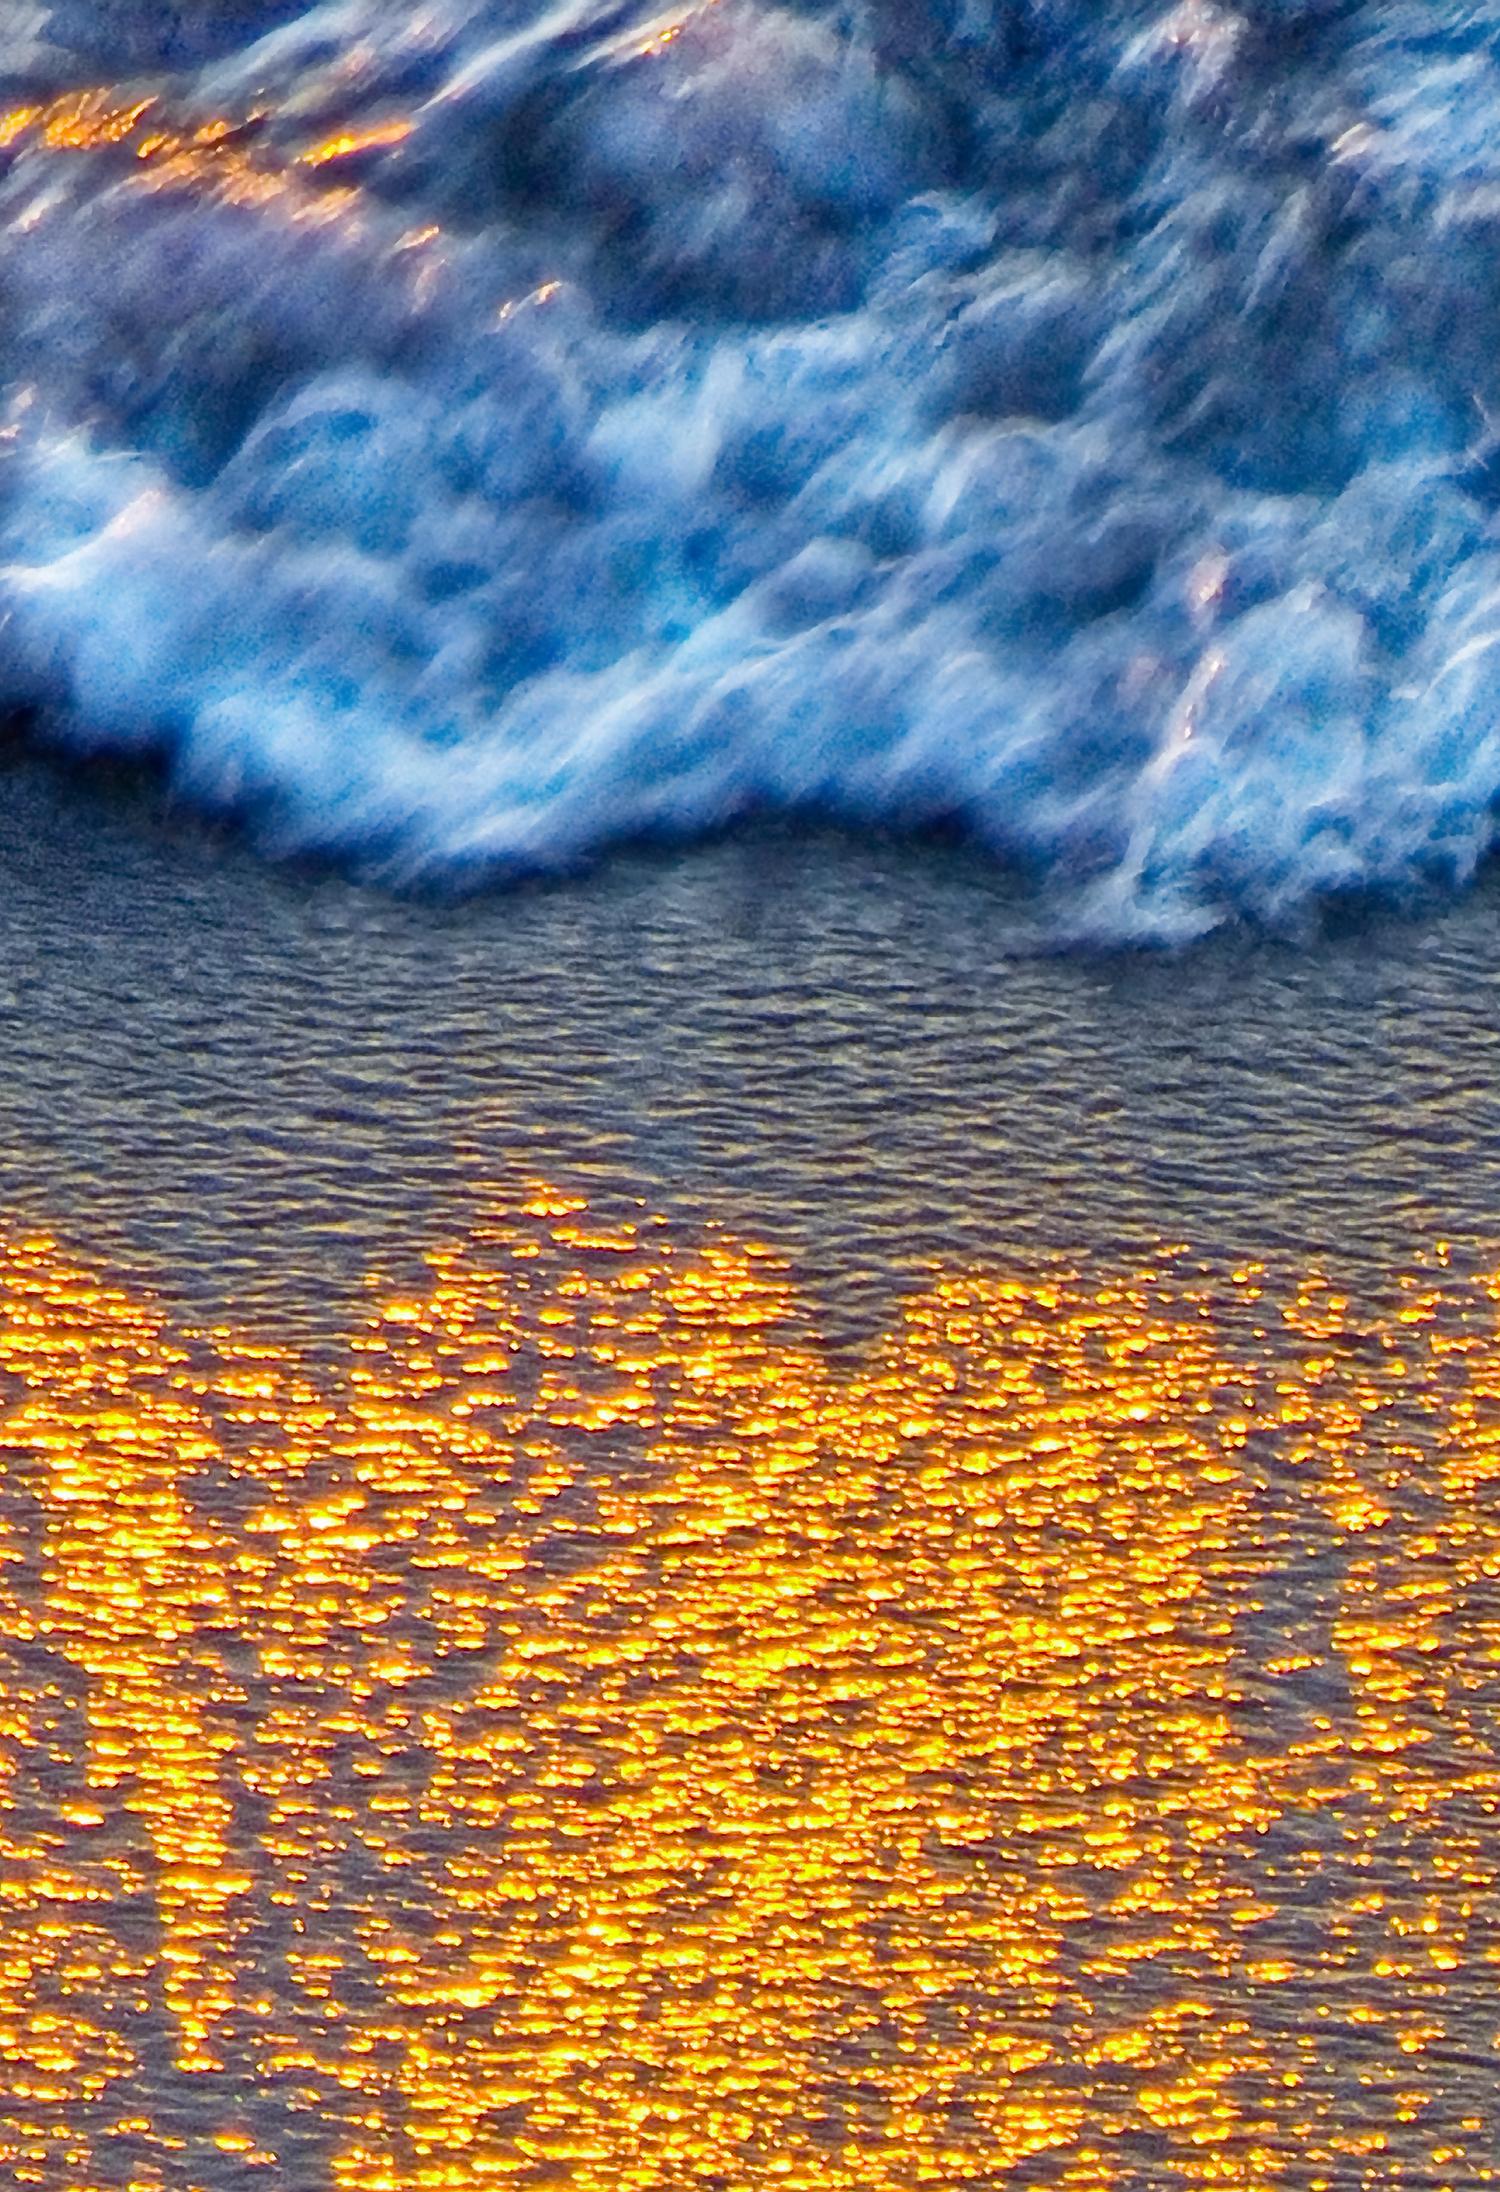 ocean_wave_sunset_1500.jpg